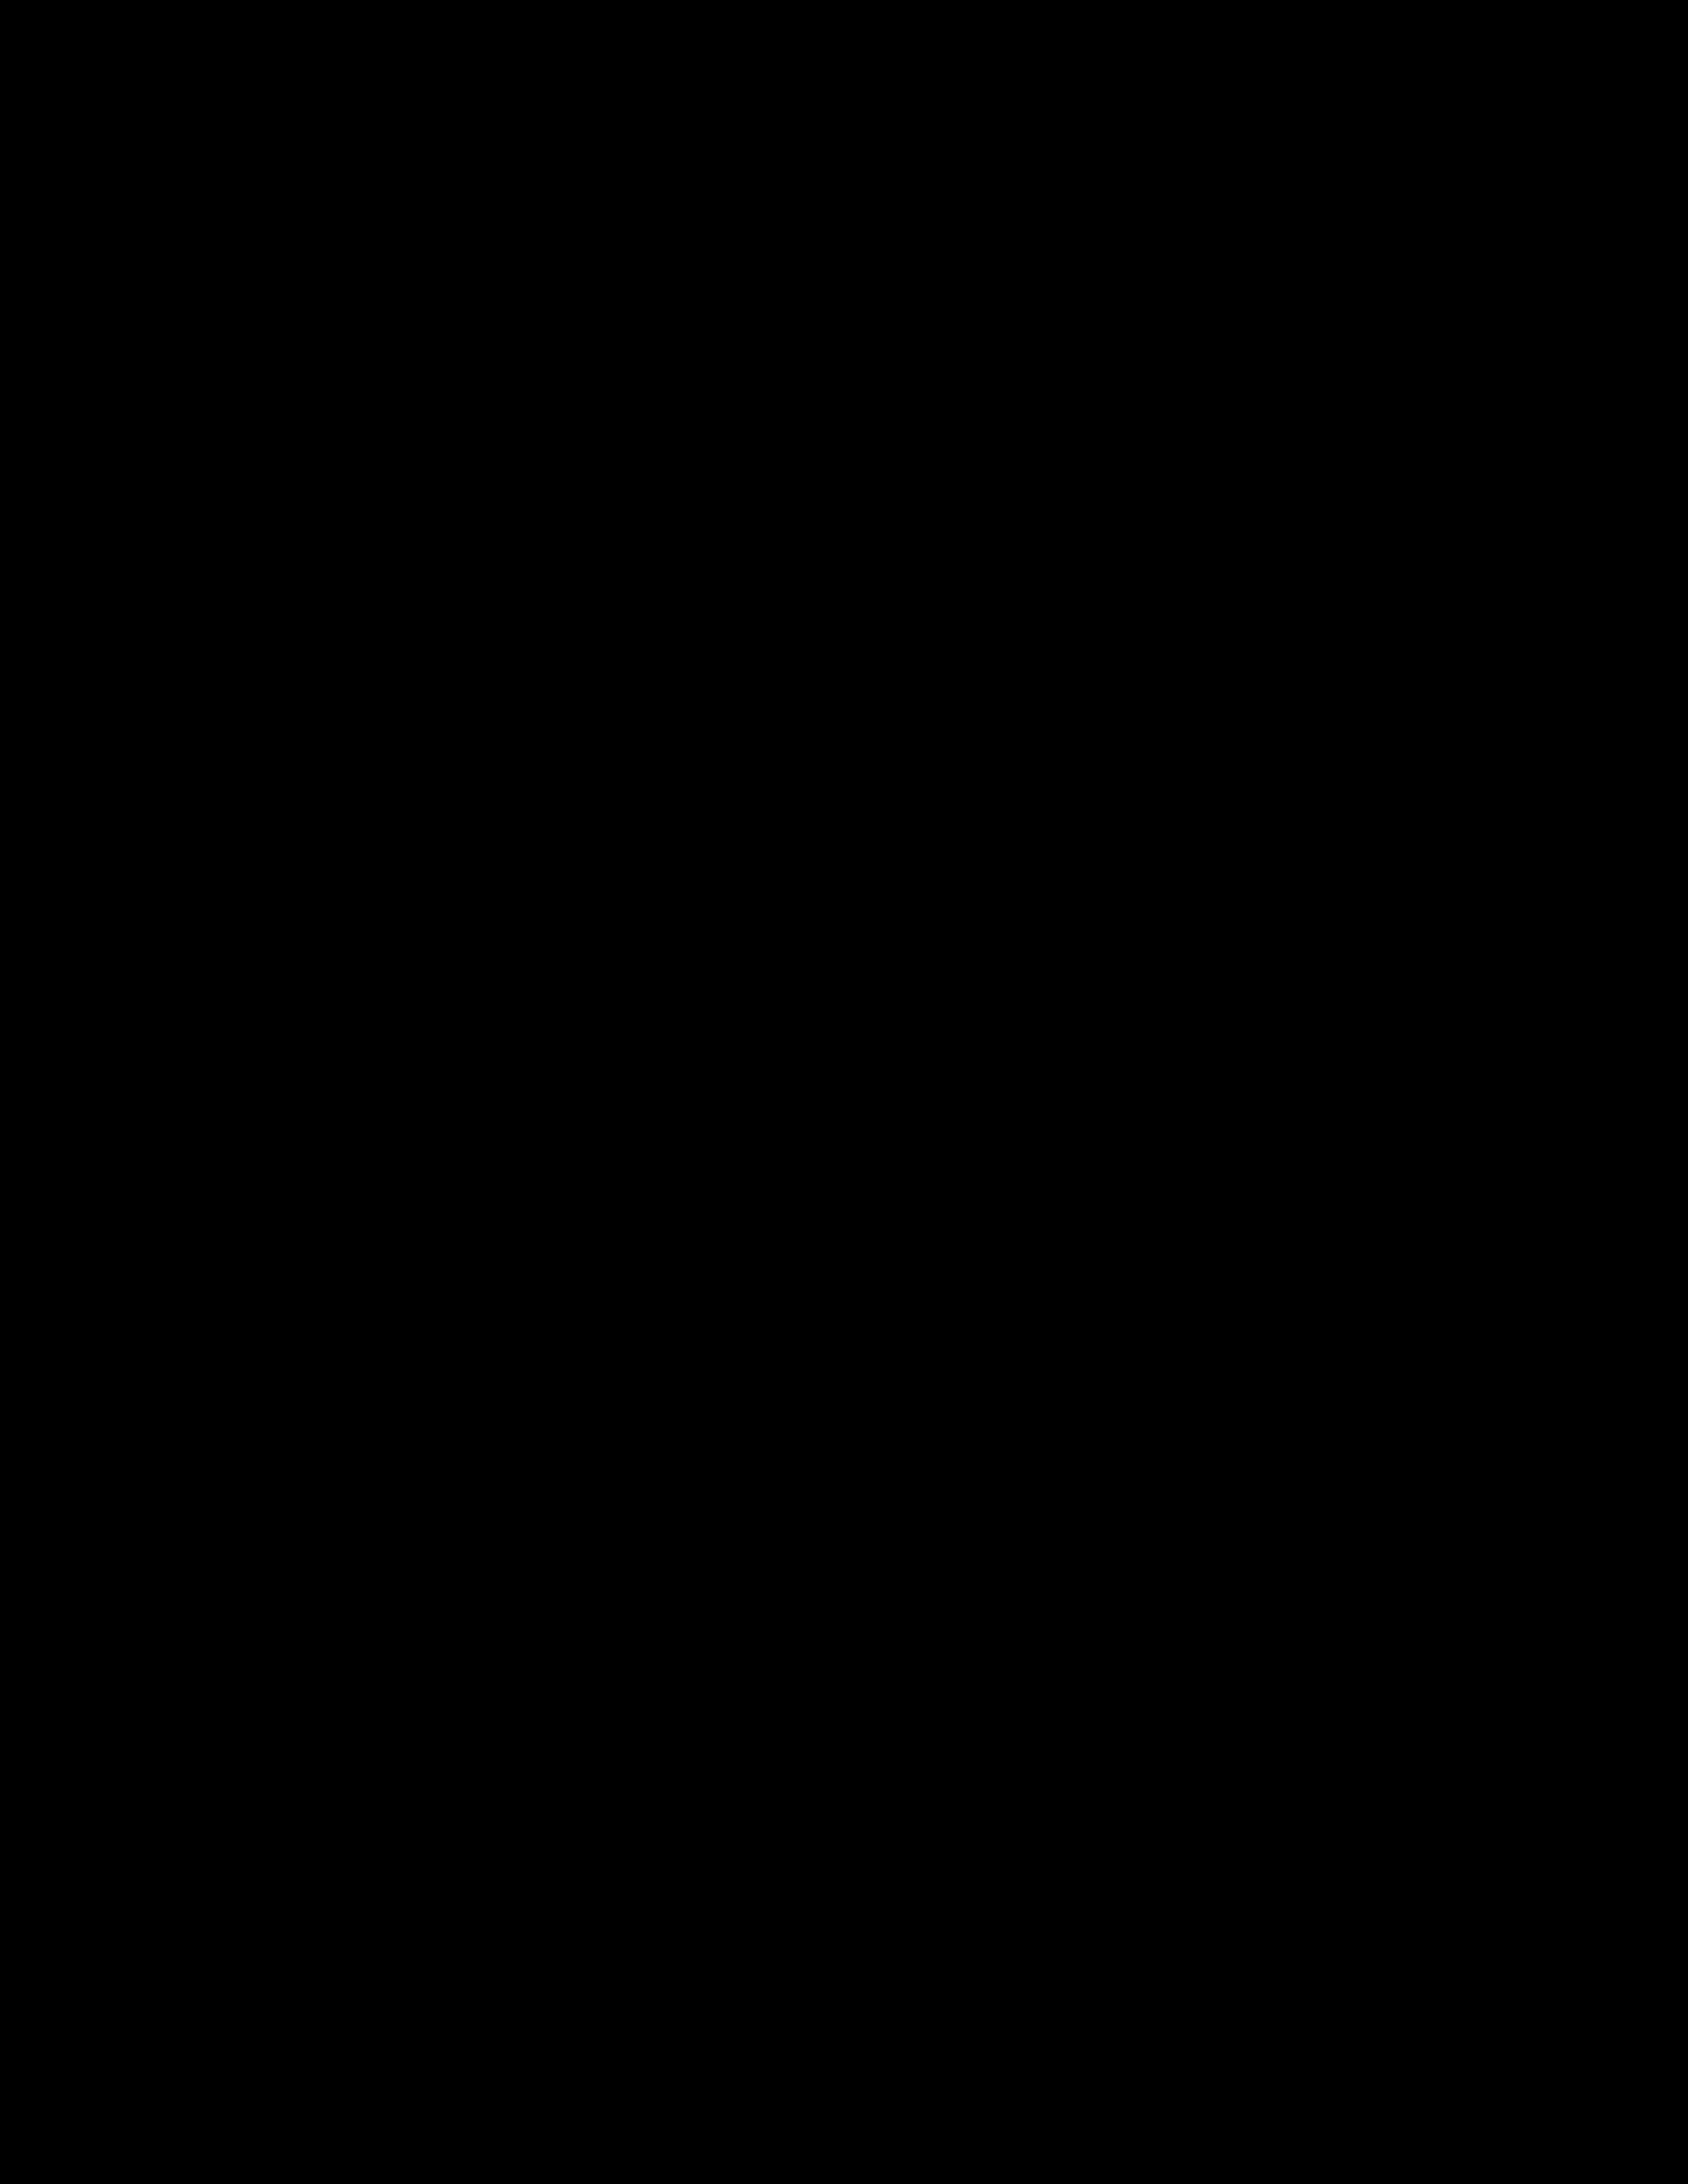 829d1b39-c4b2-4a06-92cd-6435084161d5